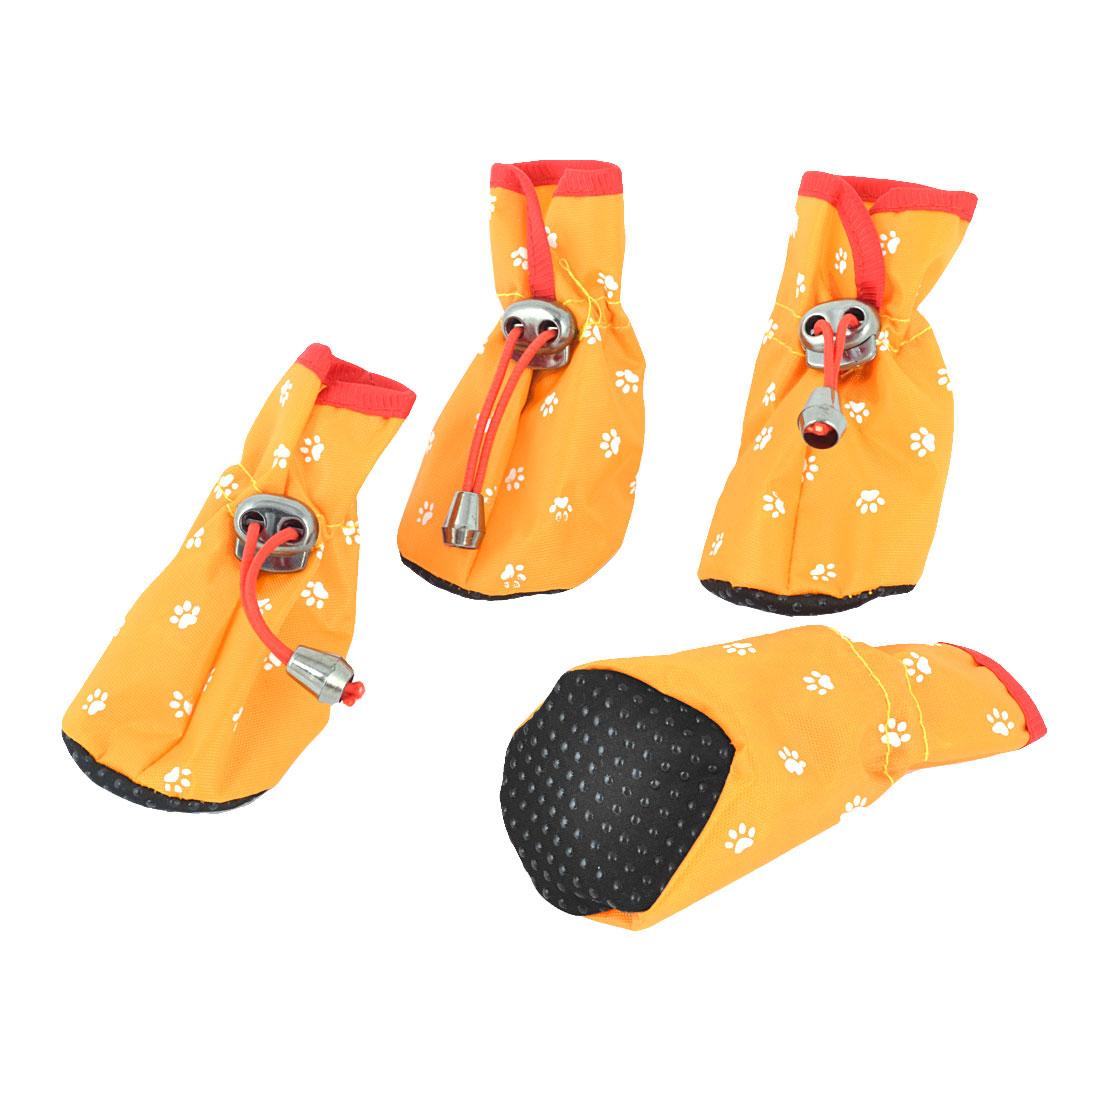 2 Pairs Nonskid Sole Paw Printed Pet Dog Yorkie Rainshoes Booties Yellow XXS